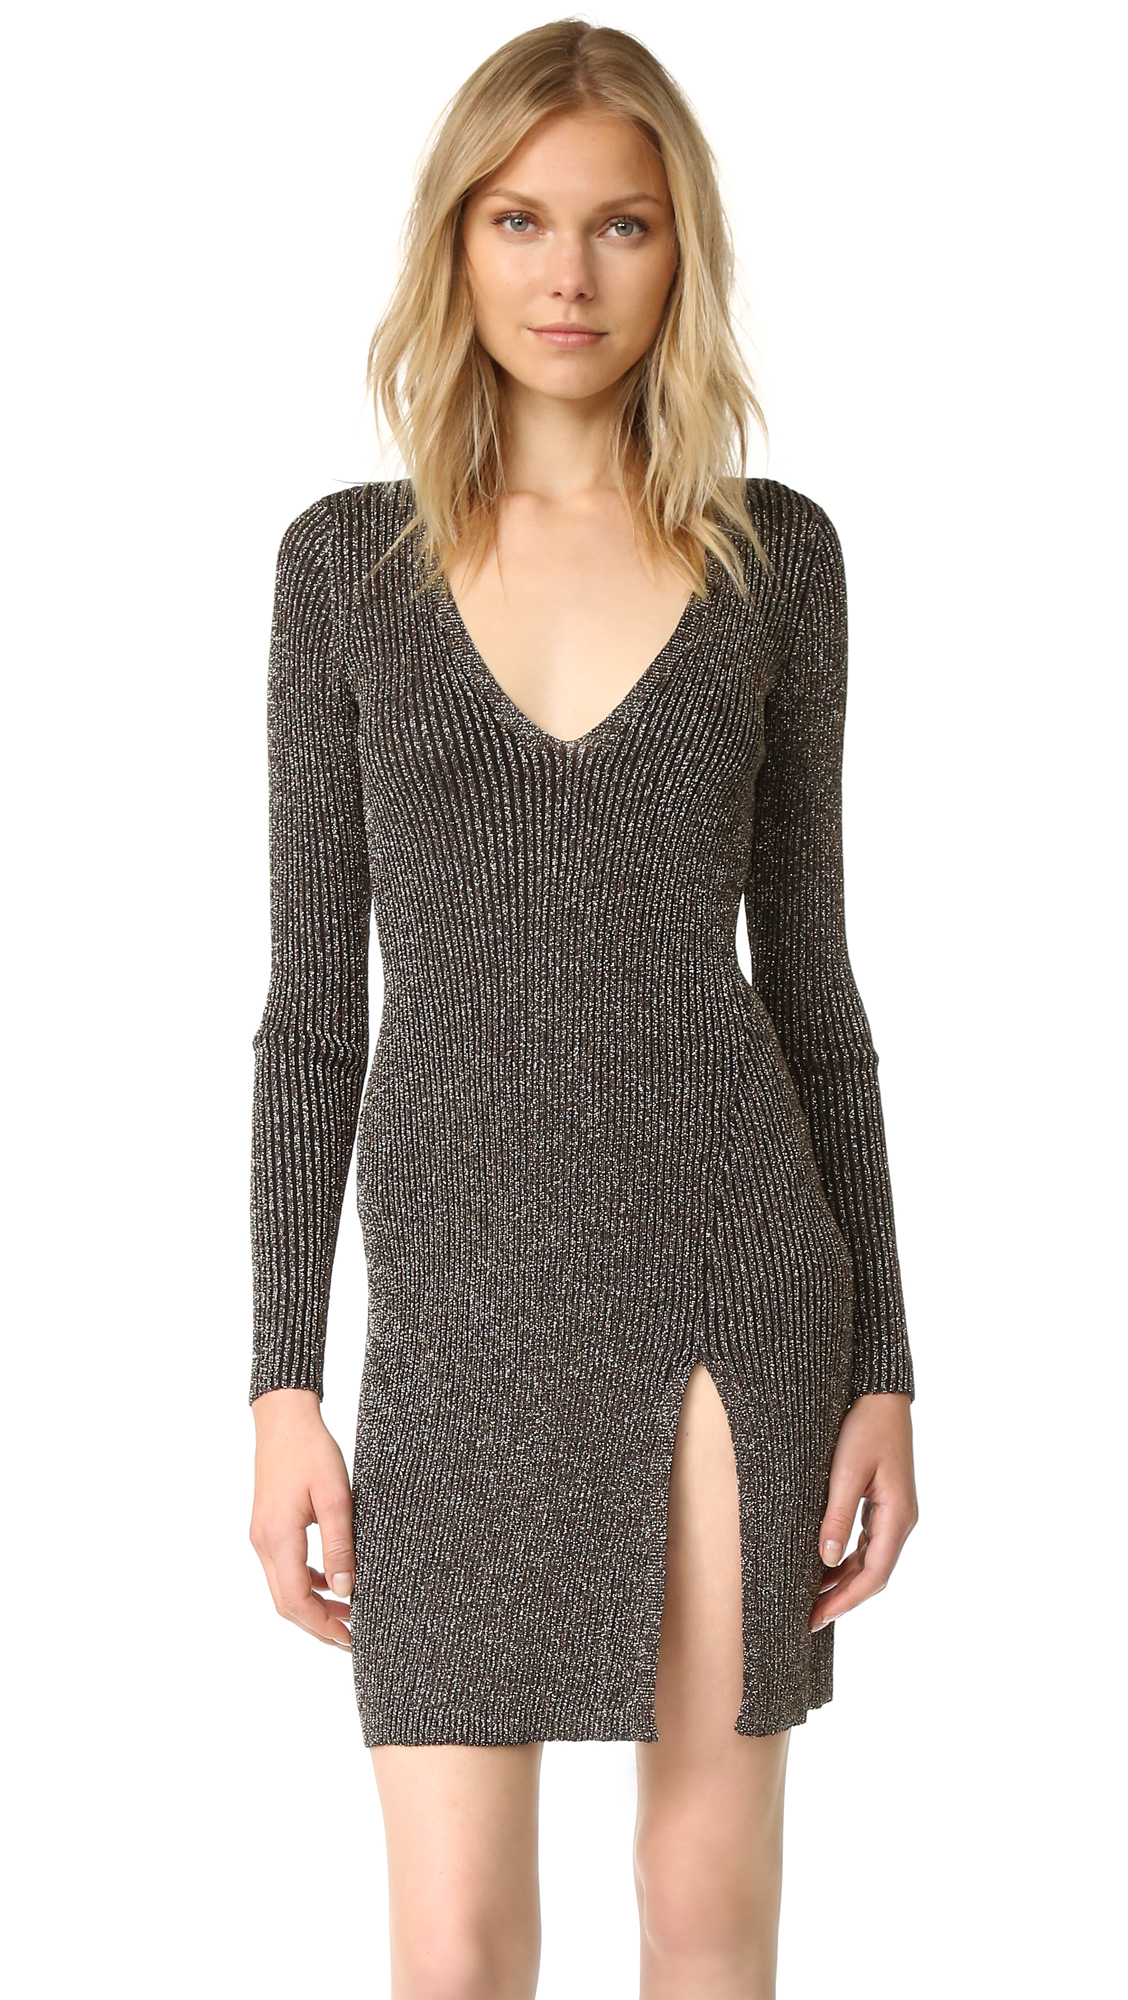 Bcbgmaxazria Deep V Lurex Mini Dress - Bronze Combo at Shopbop